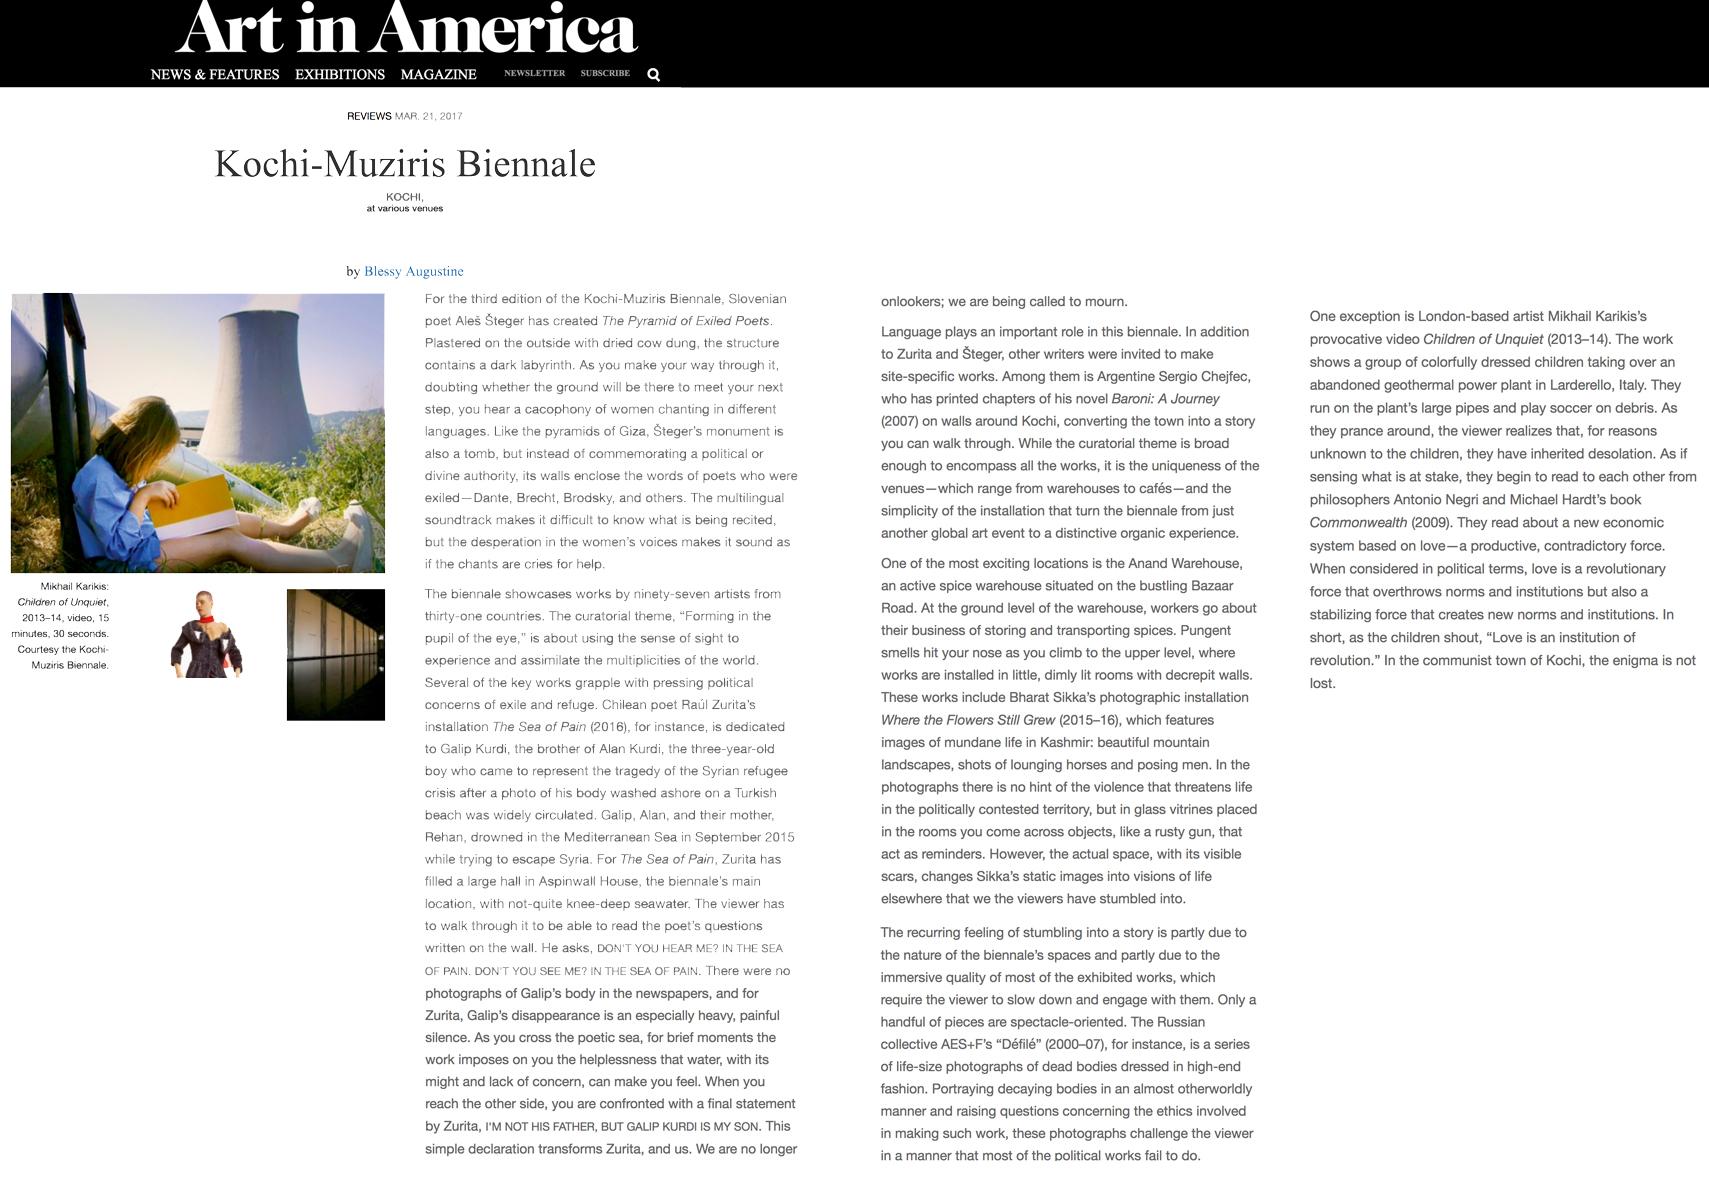 Art in America: Kochi-Muziris Biennale 2016-2017 (review)